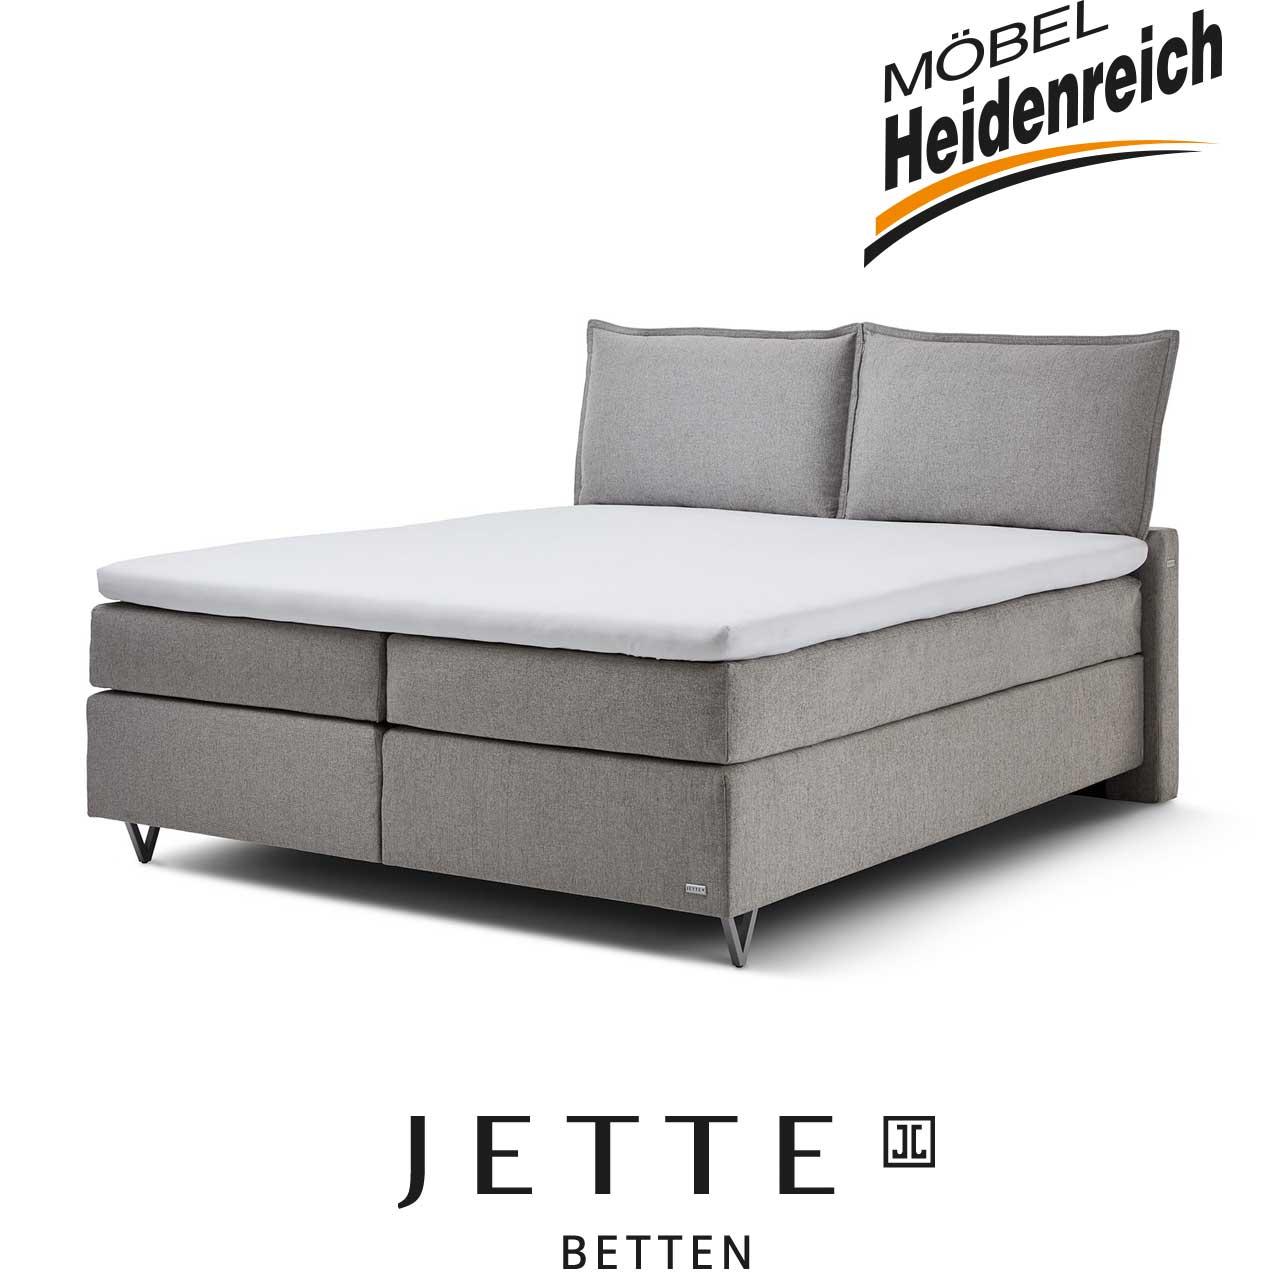 Jette Betten Polsterbett Bettkasten 106